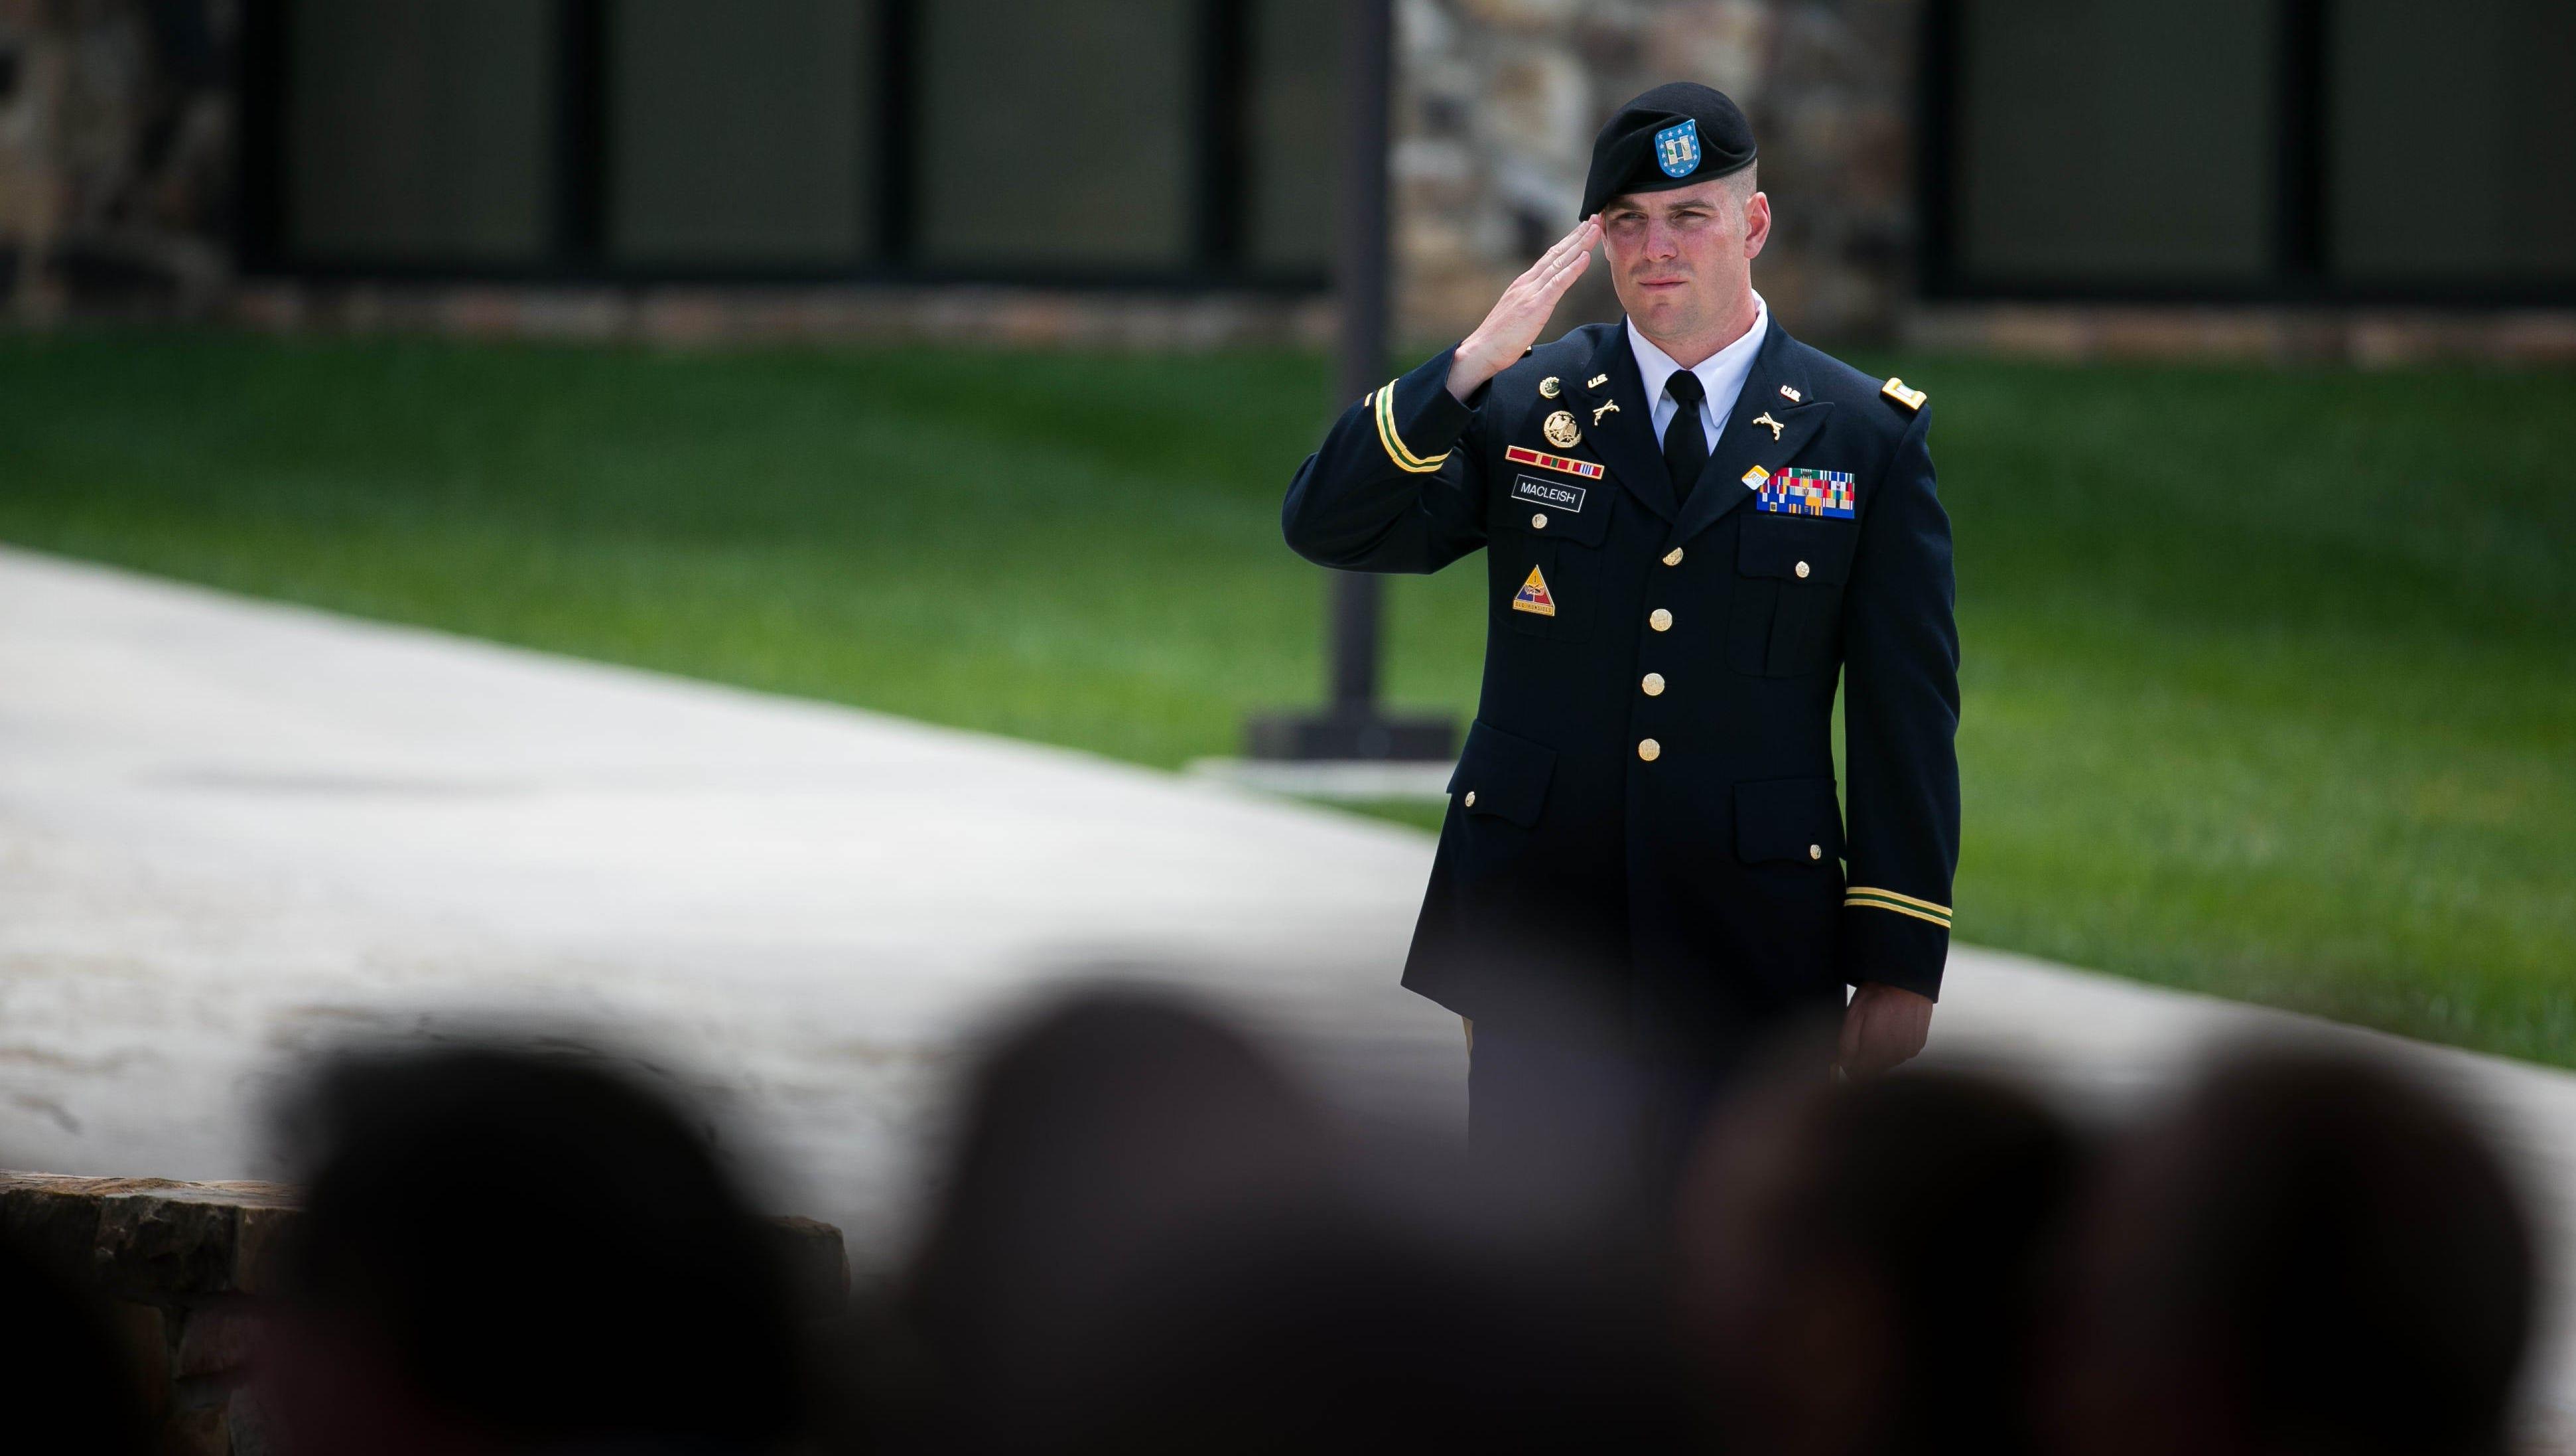 Joe Biden Speaks At National Guard S Naming Of Headquarters After Beau